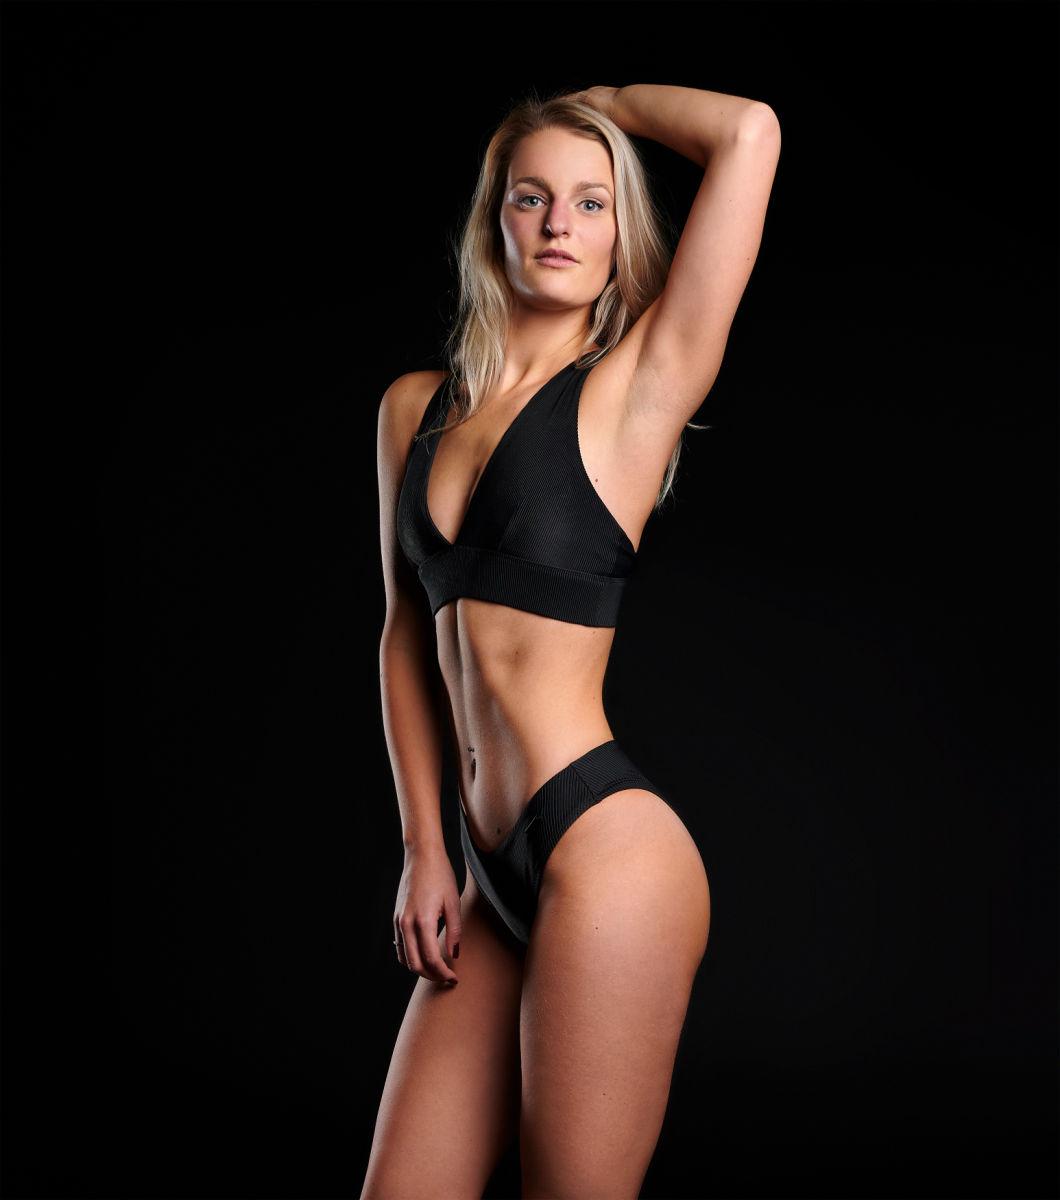 fitness fotoshoot